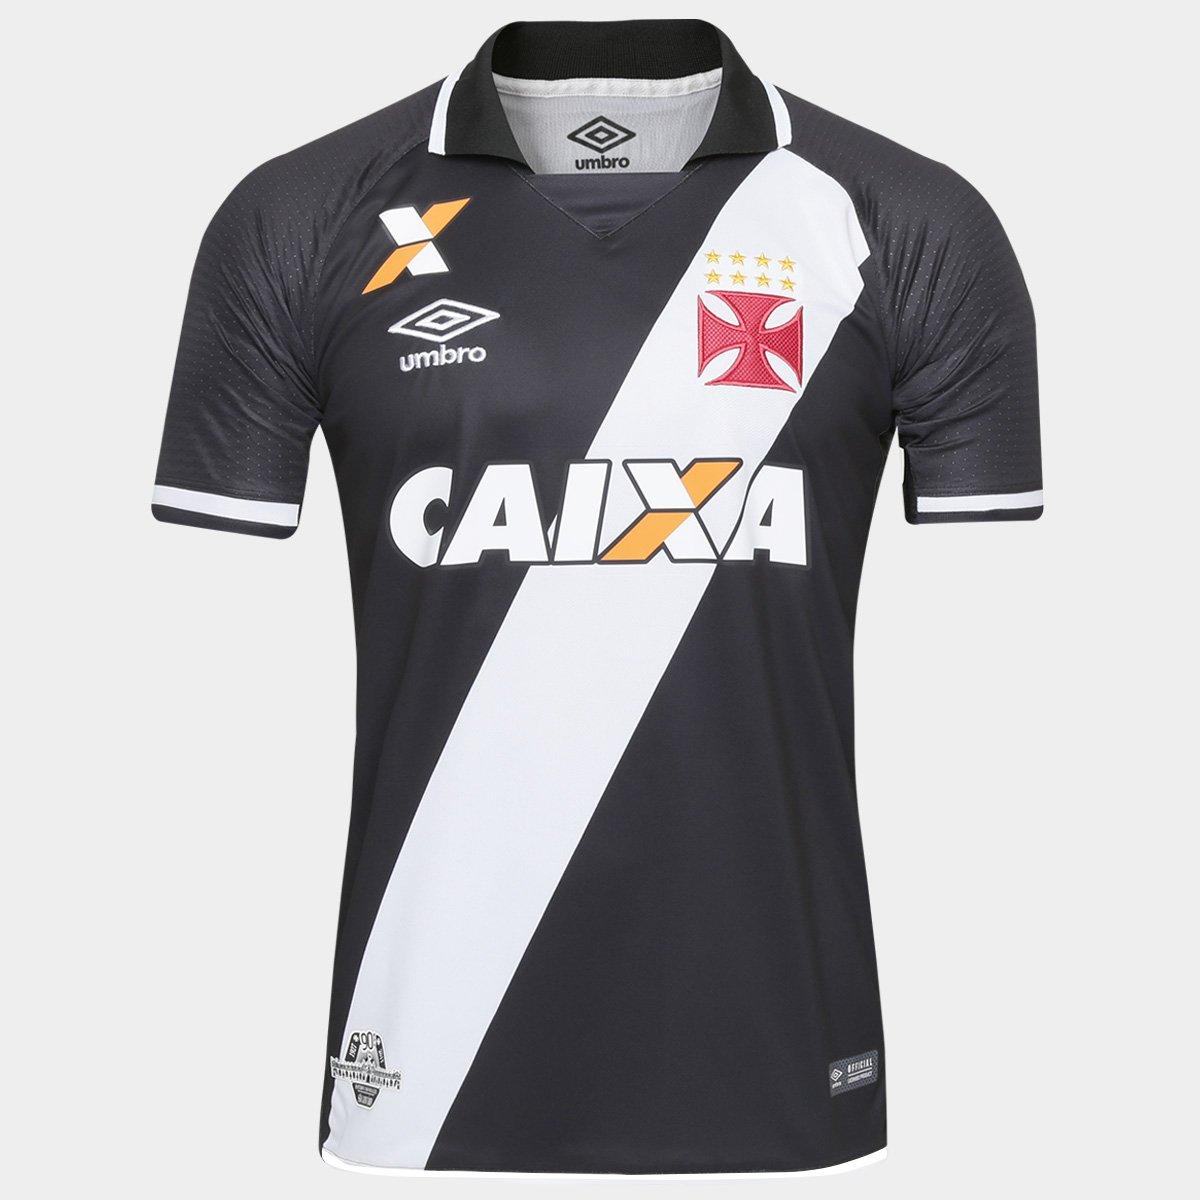 535bcf2f1fb94 Camisa Vasco I 17 18 s nº Torcedor Umbro Masculina - Compre Agora ...